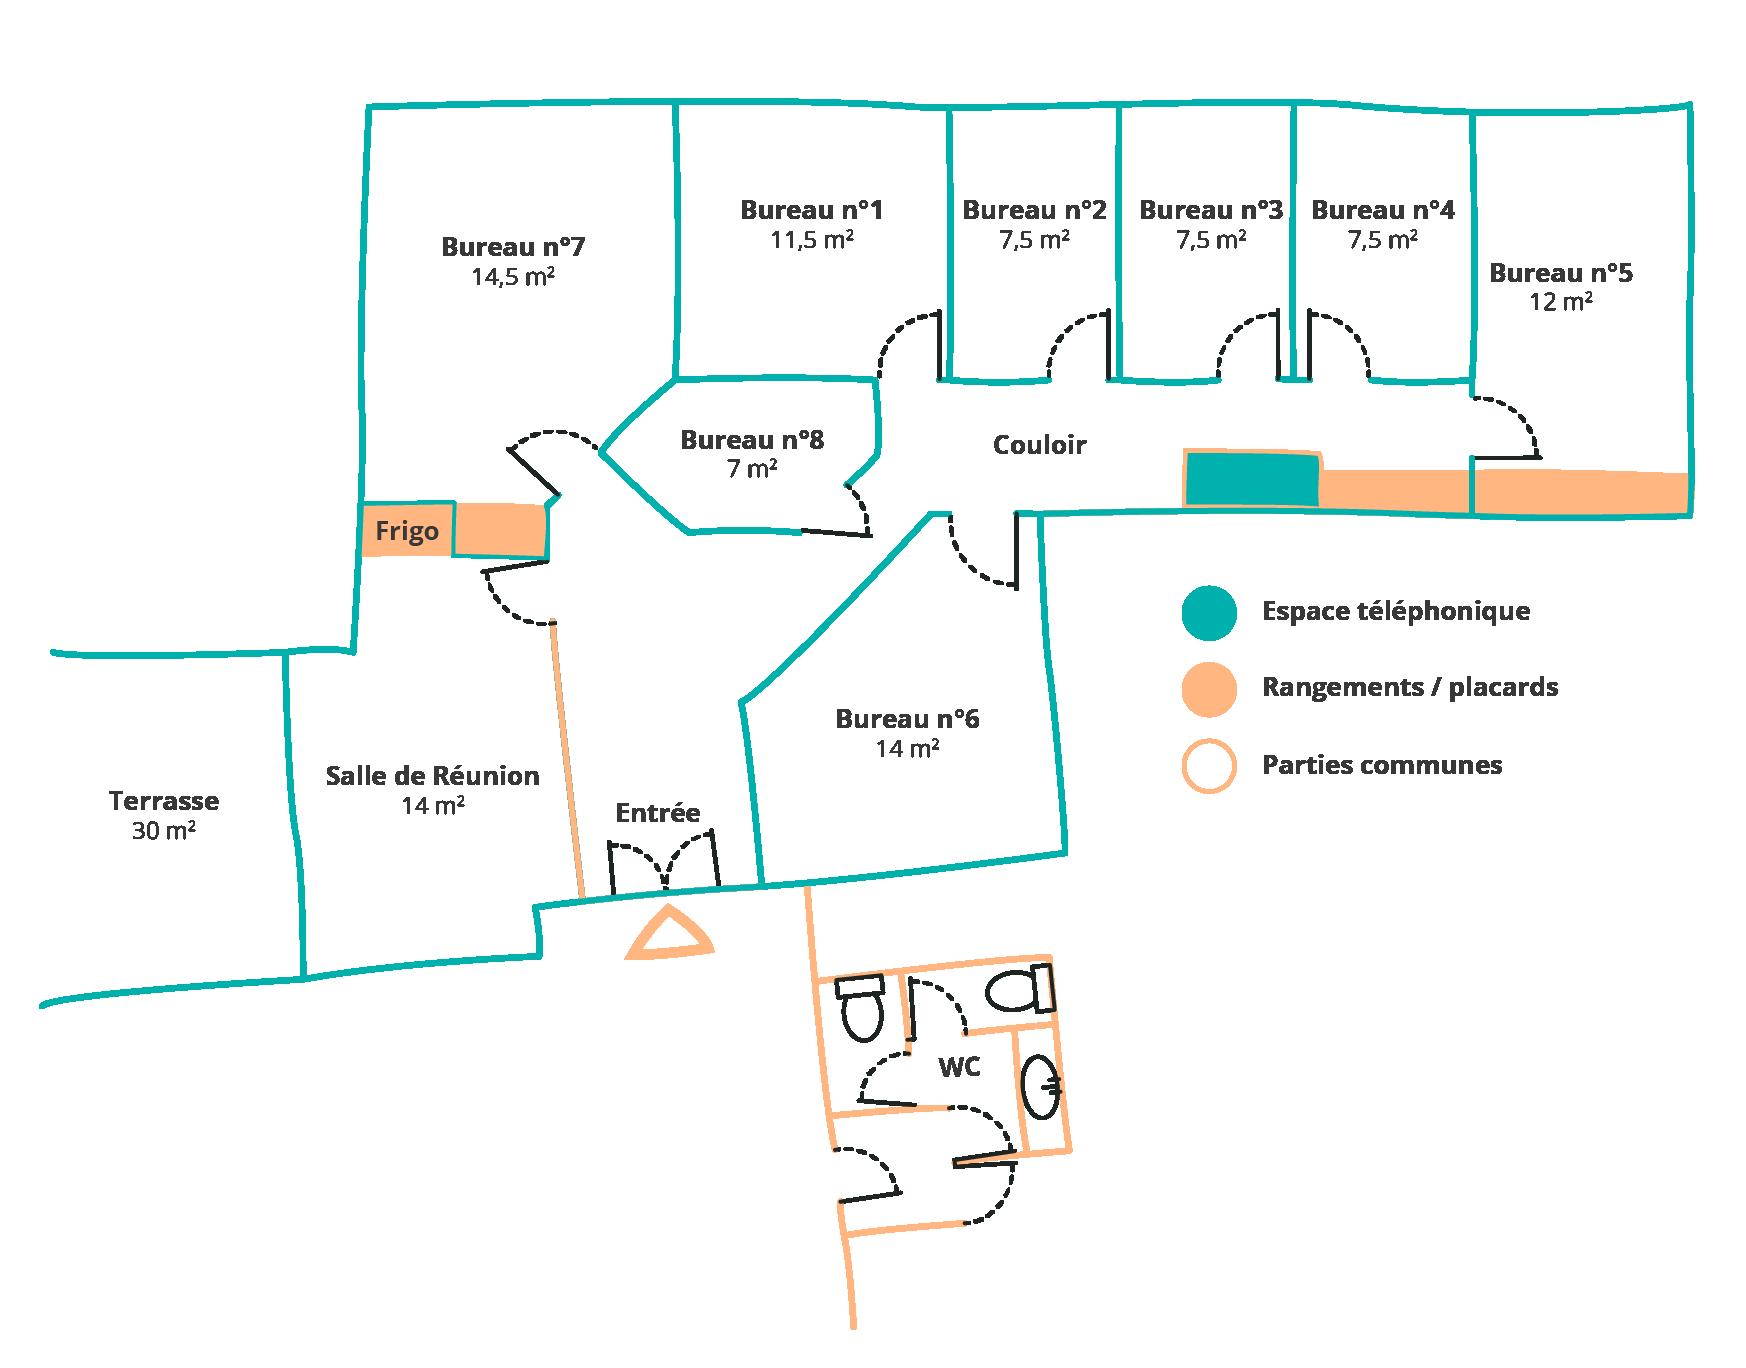 Plan des bureaux de Bordo Buro